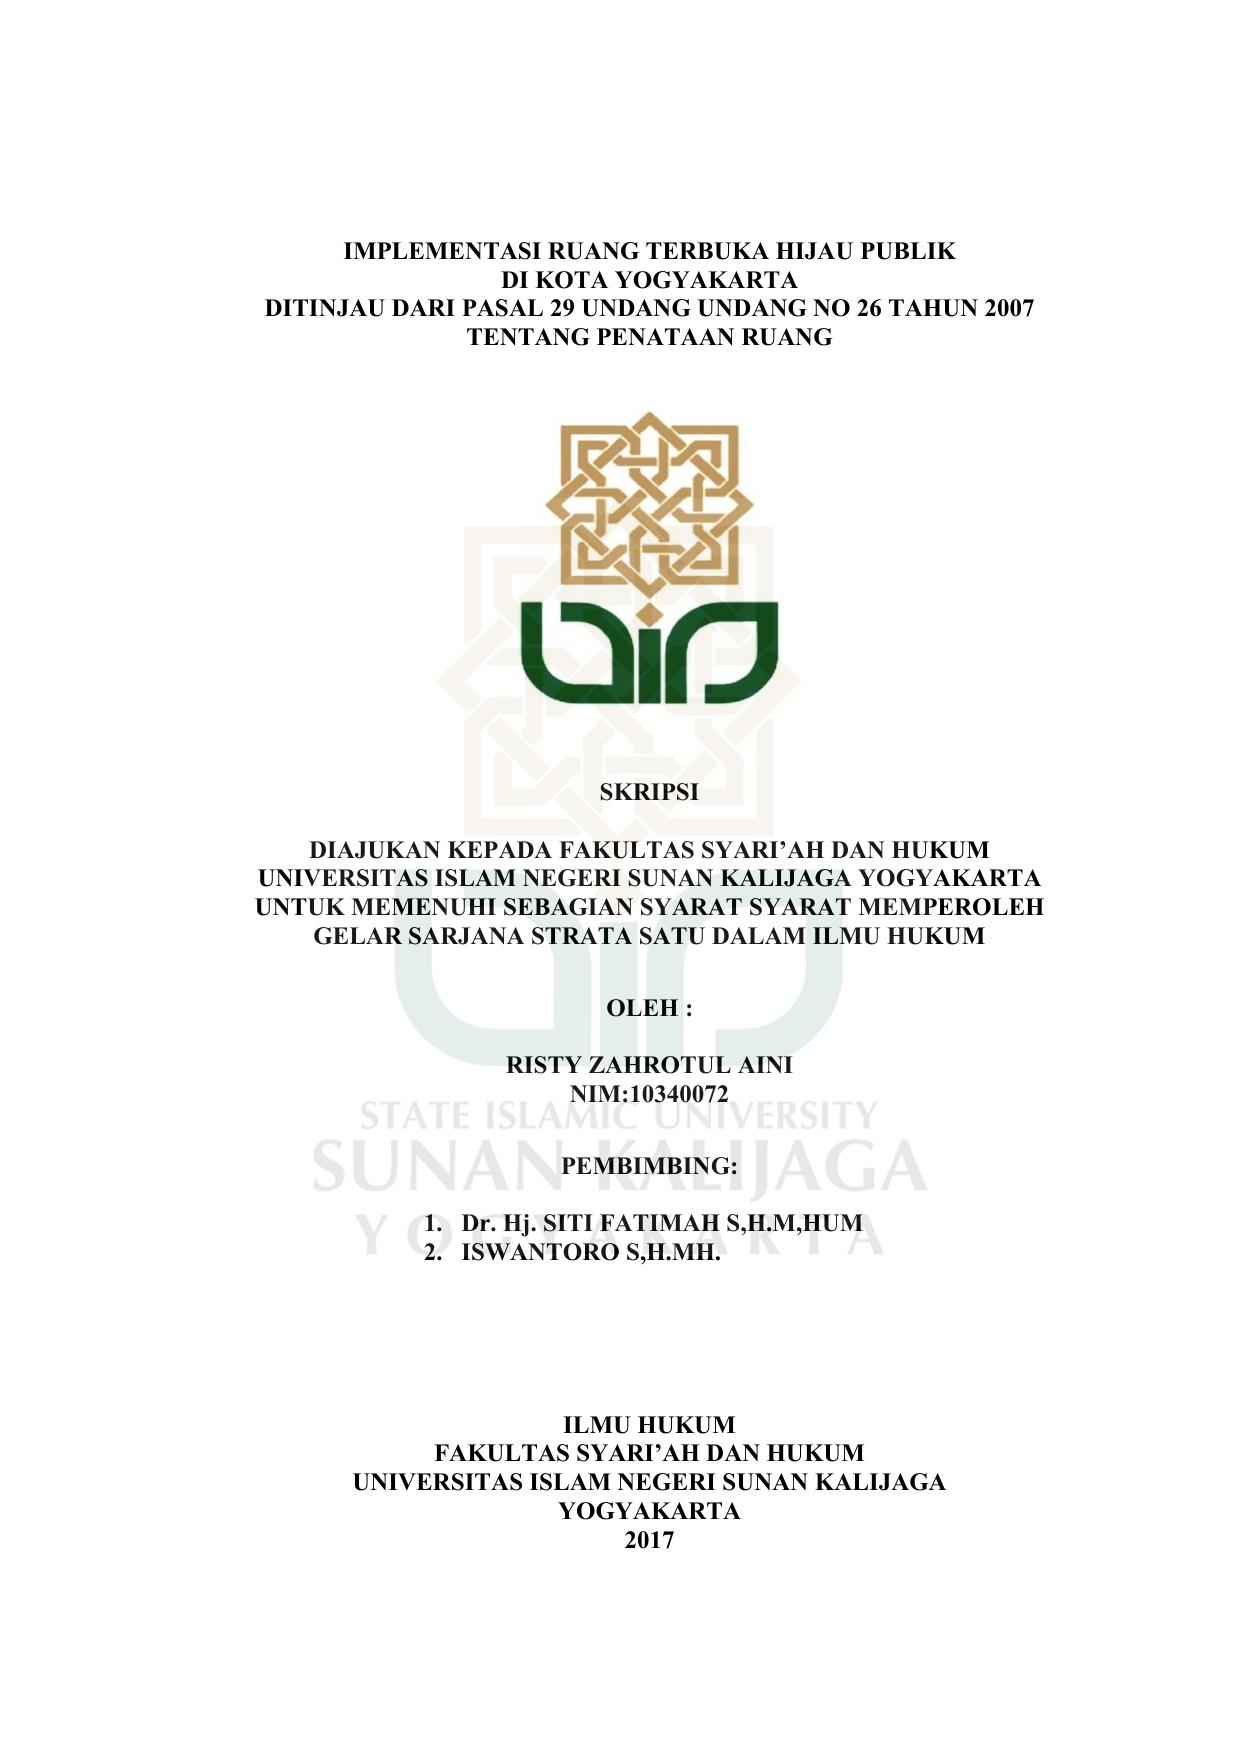 Implementasi Ruang Terbuka Hijau Publik Di Kota Yogyakarta Ditinjau